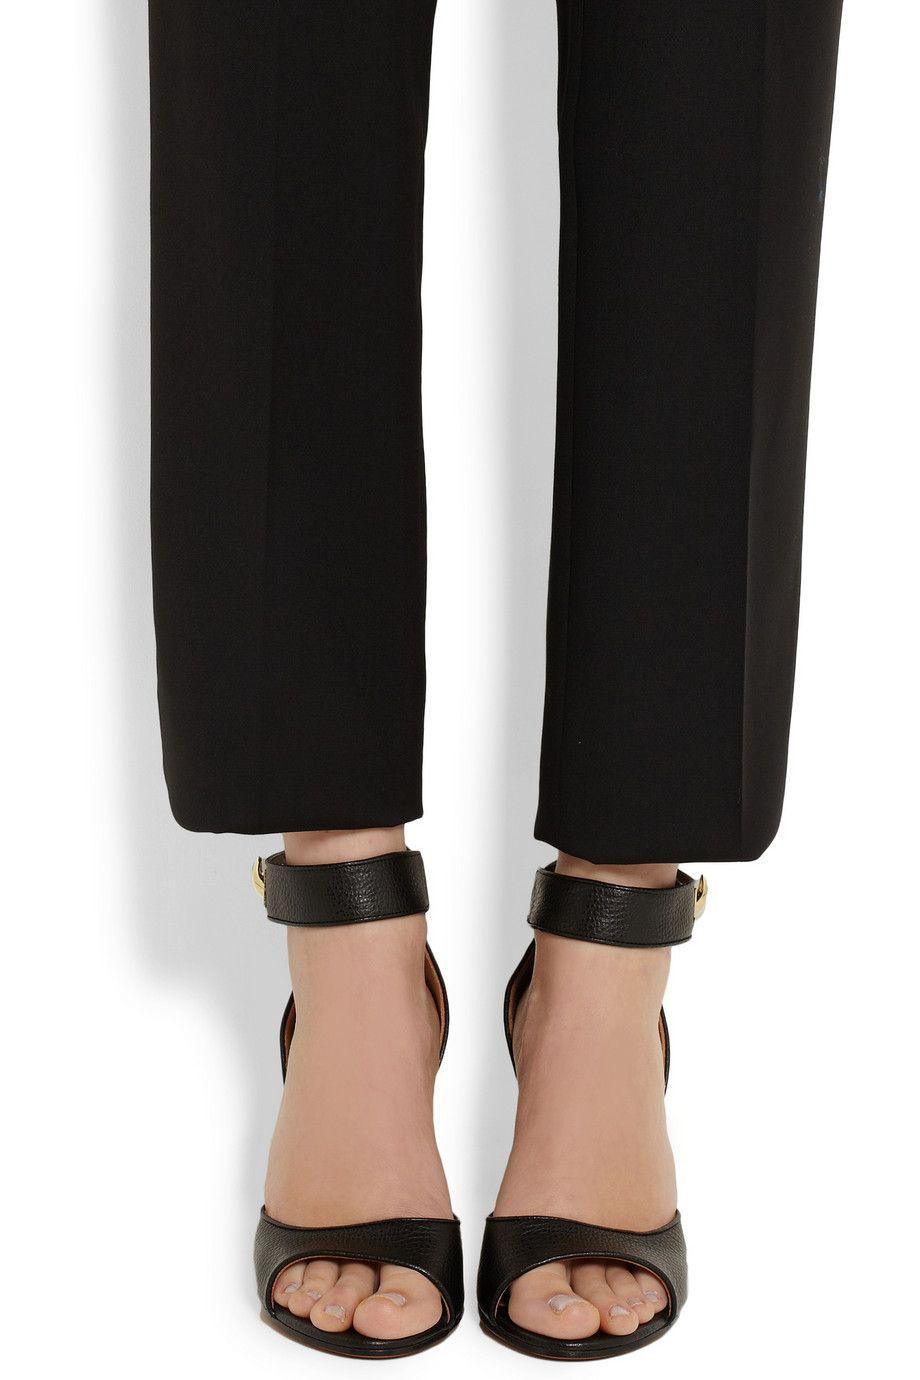 Textured Porter Shark Leather Givenchy Lock A Sandals Net com EzqTF